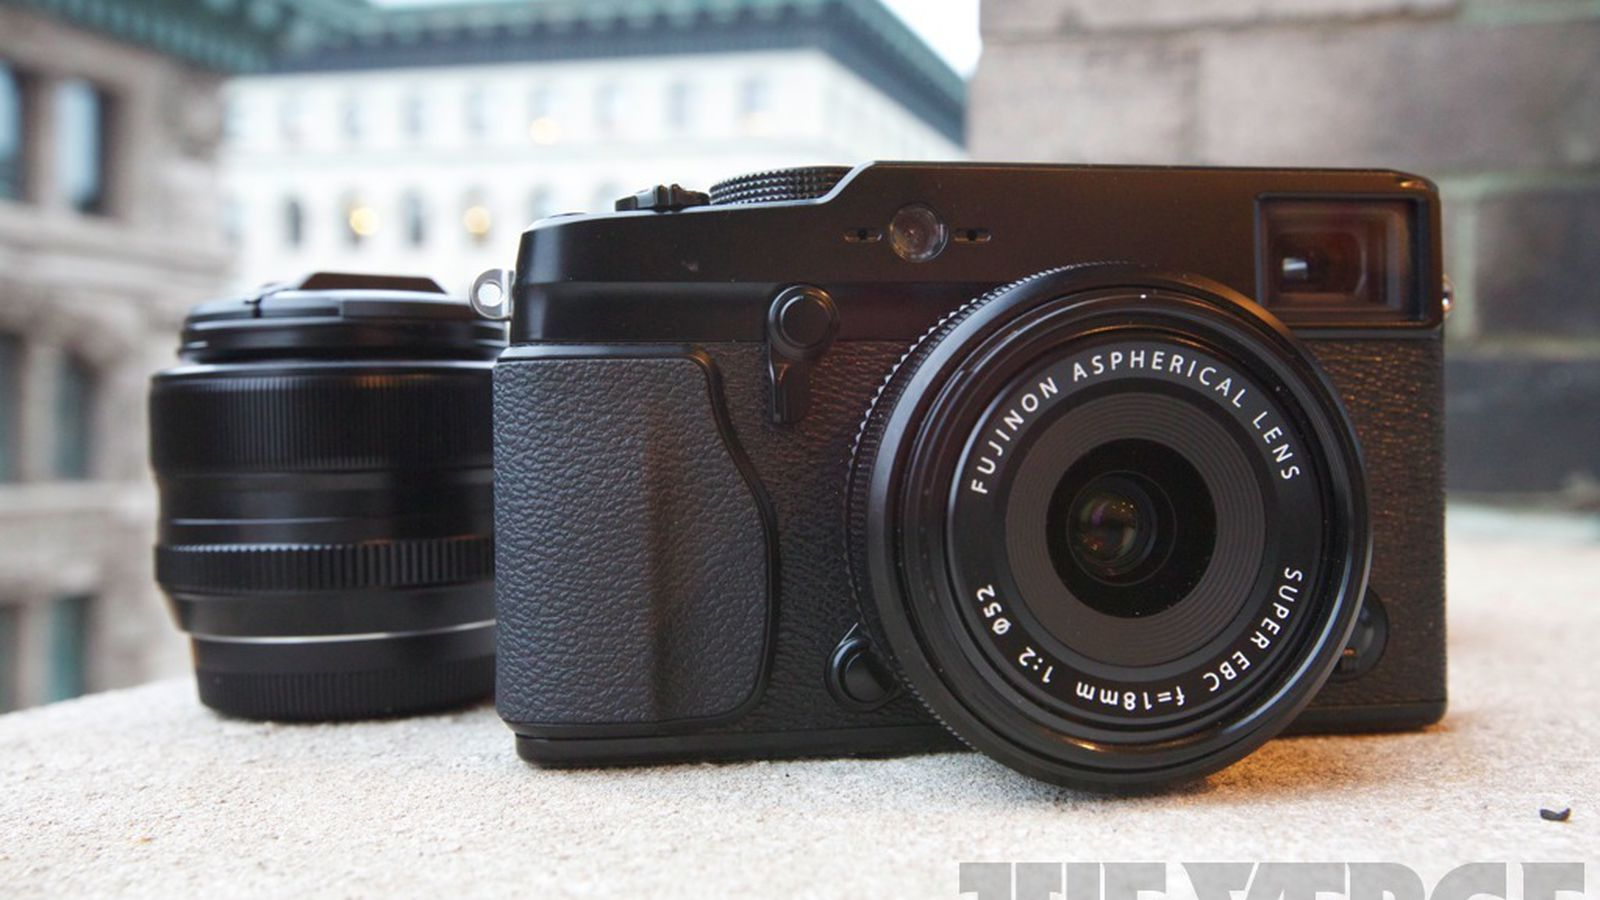 Fujifilm X Pro1 Review